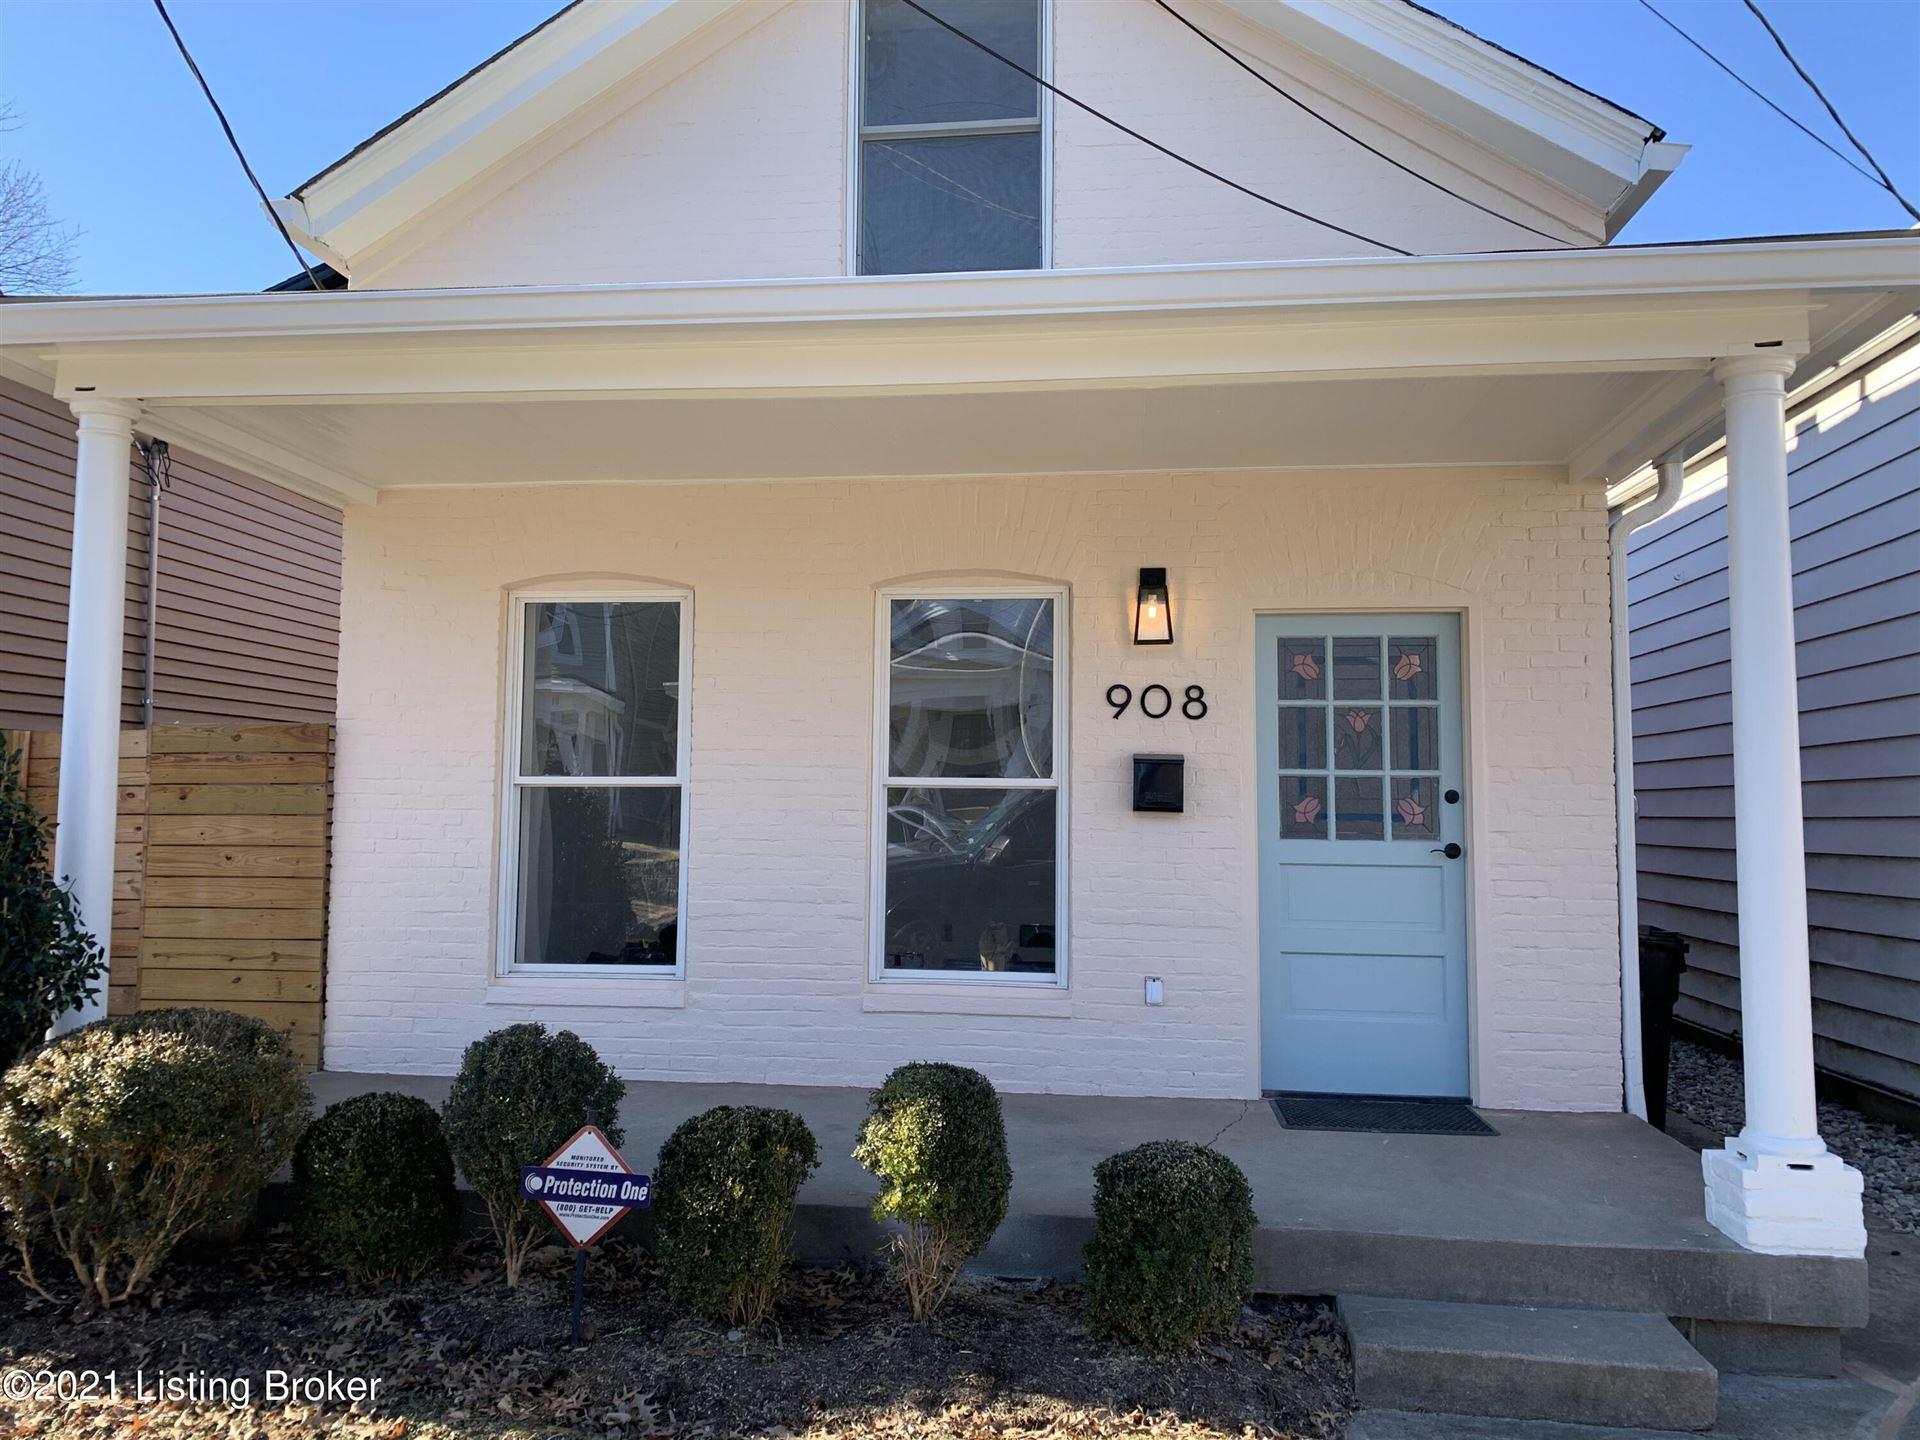 Photo for 908 Vine St, Louisville, KY 40204 (MLS # 1579419)